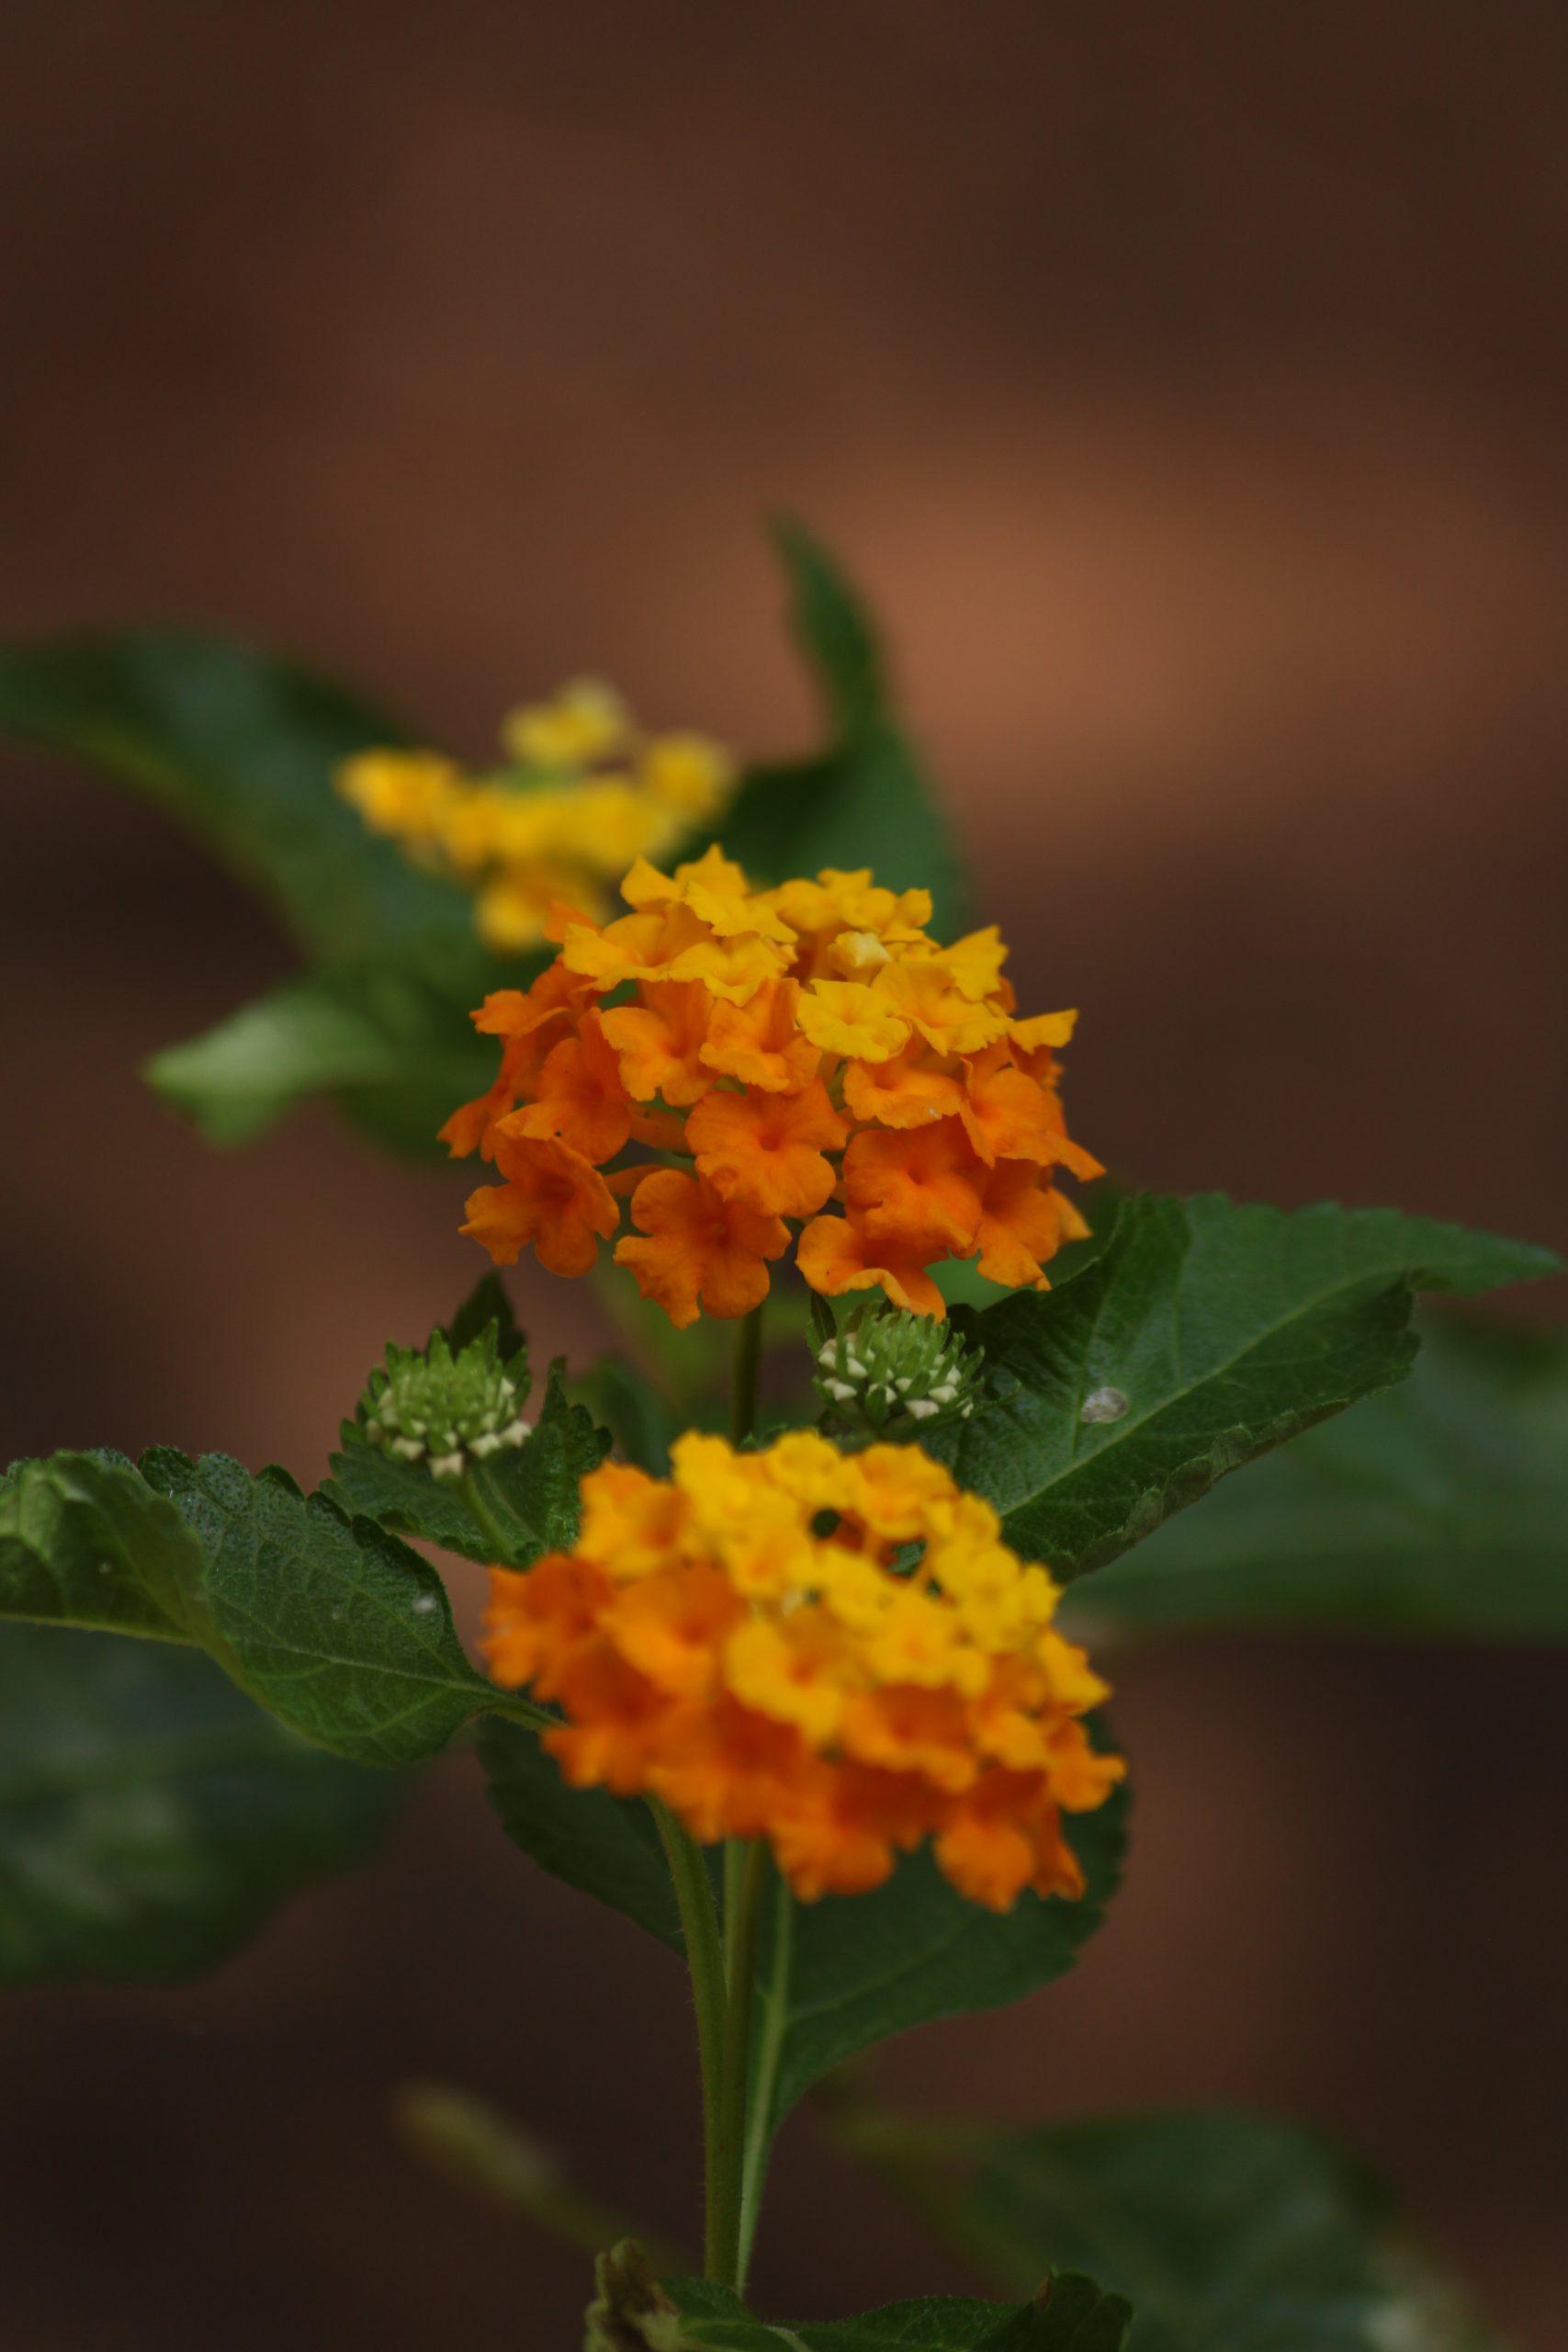 Flowers on plant